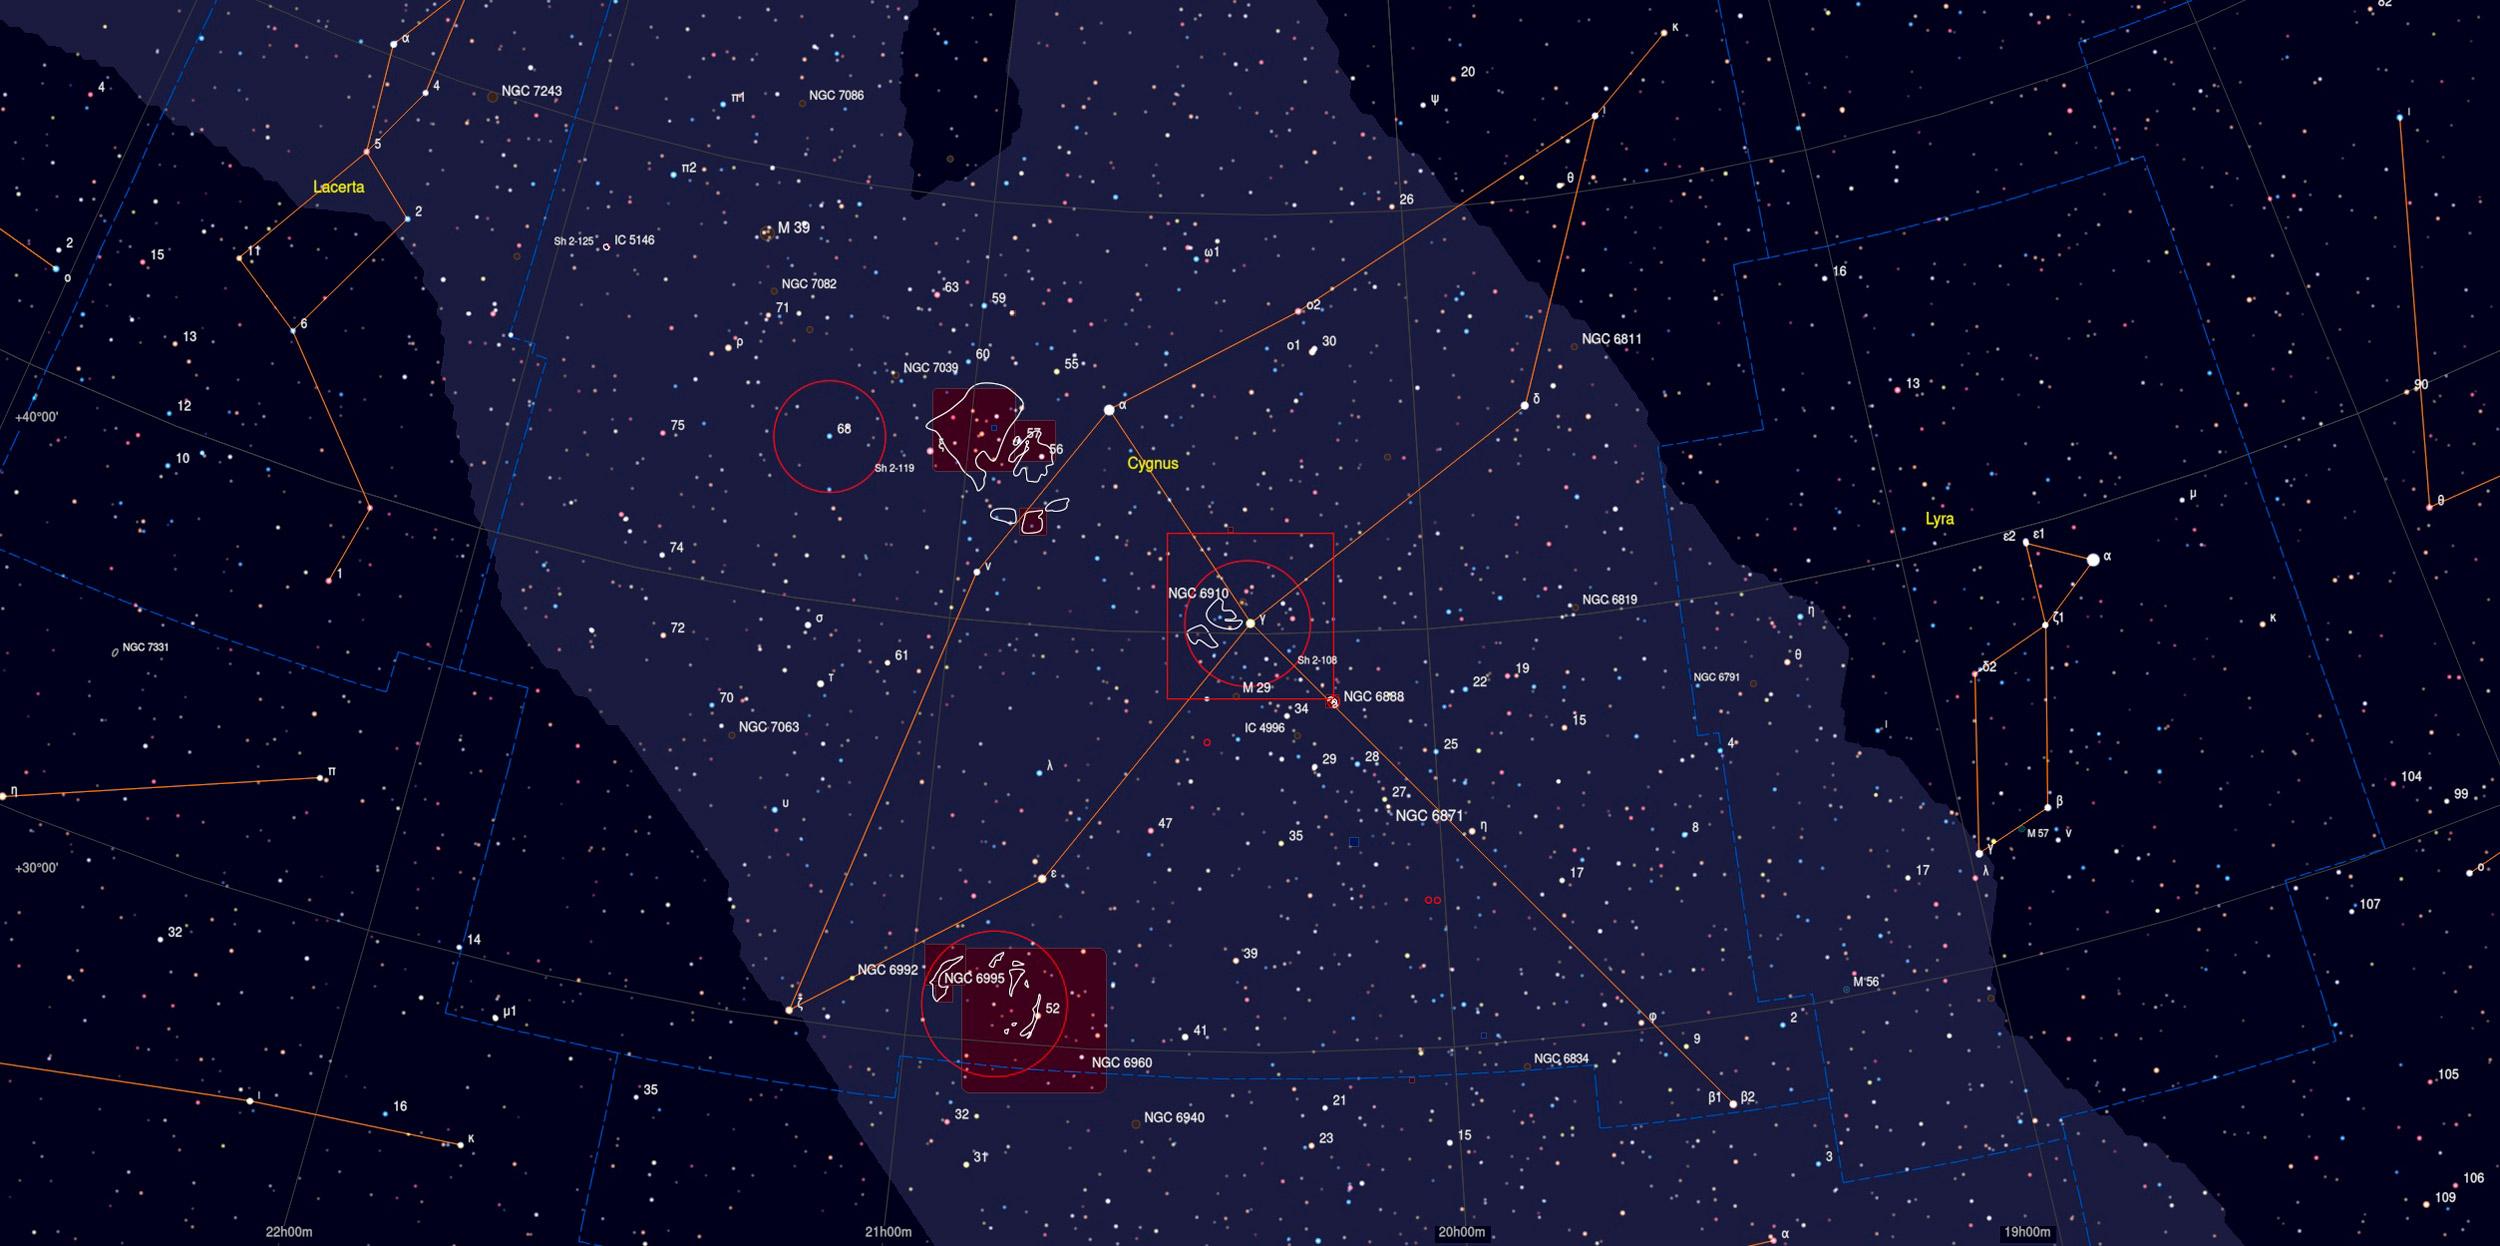 Gamma Cygni Region Sky Chart - Astrophotography Martin Rusterholz